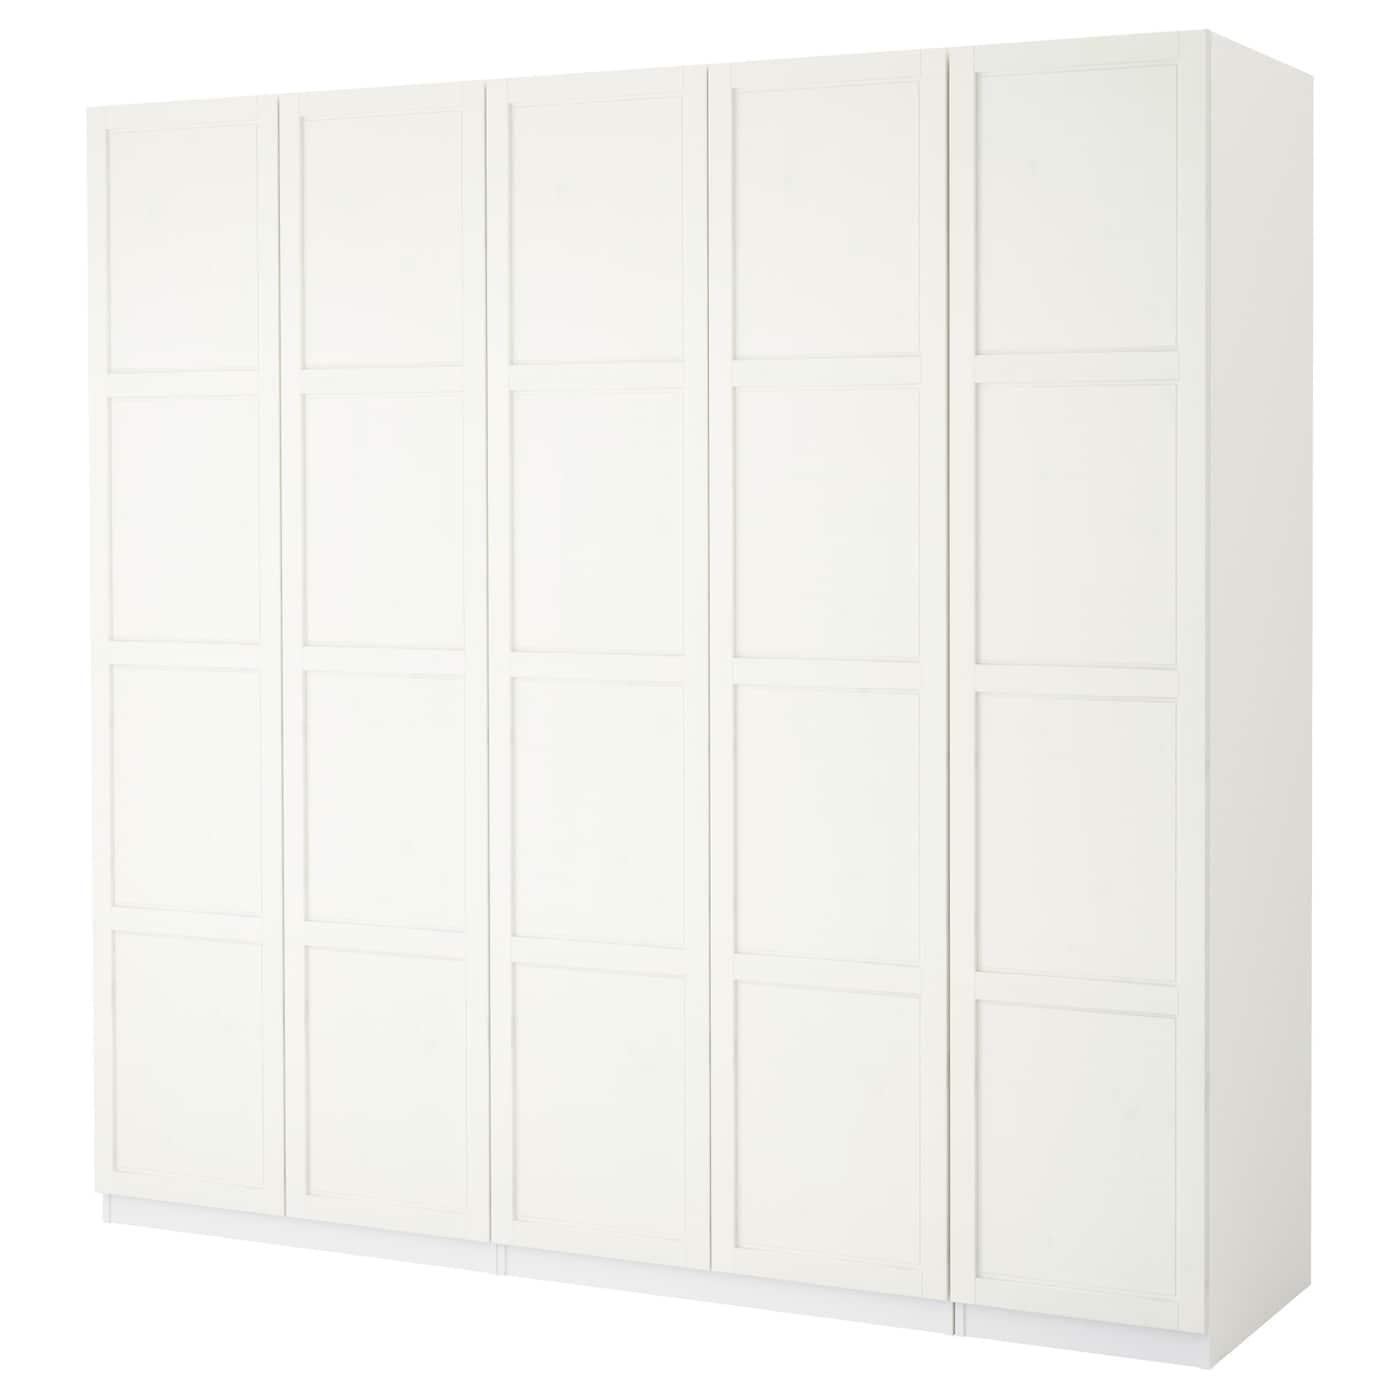 Pax armoire penderie blanc hemnes teint blanc 250x60x236 cm ikea - Armoire peu profonde ...